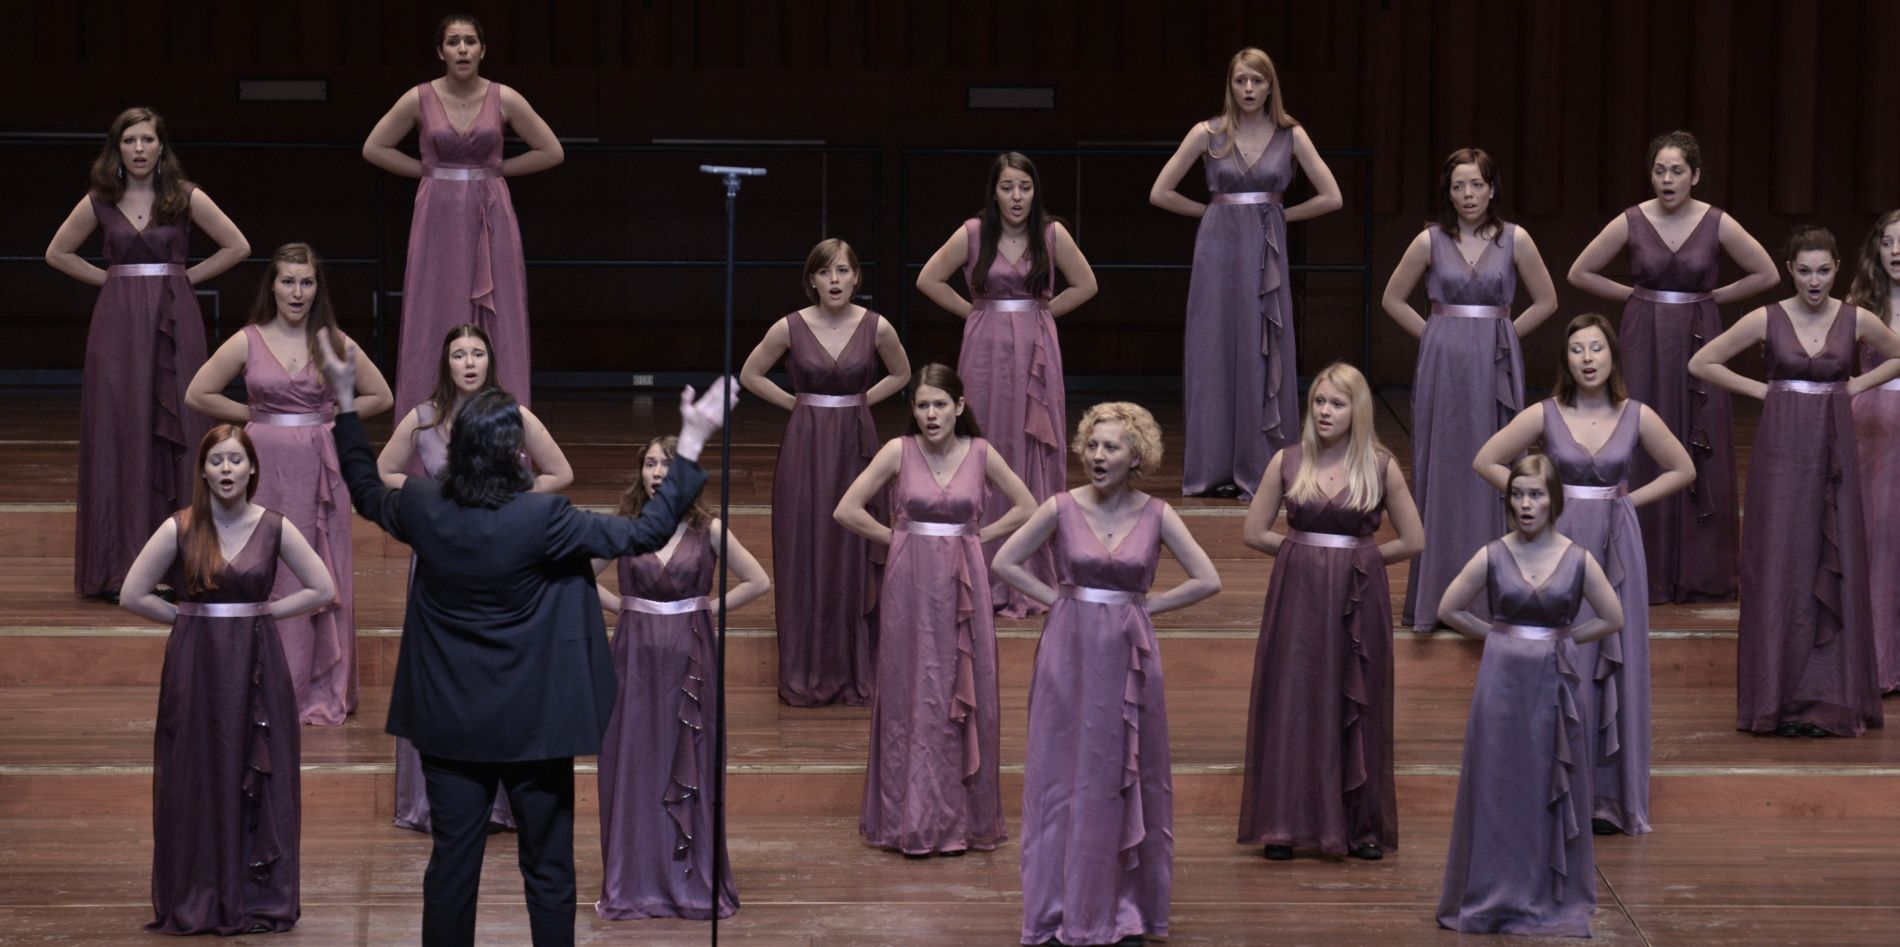 Montreux Choral Festival 2018